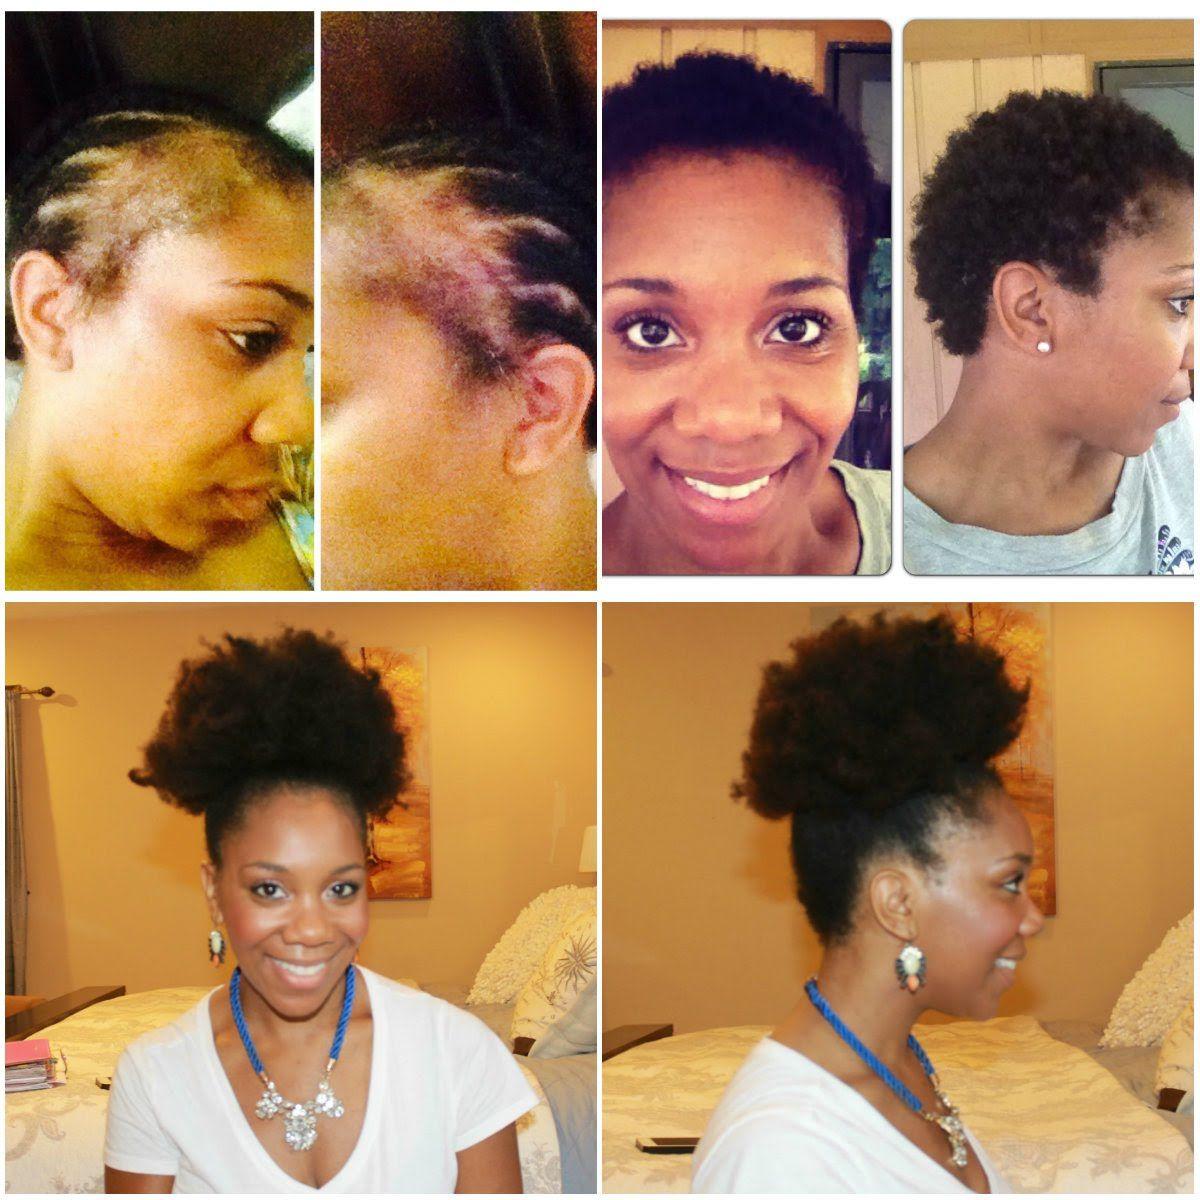 Fight Alopecia Naturally 10 Steps To Restoration Alopecia Natural Hair Natural Hair Loss Natural Hair Loss Treatment